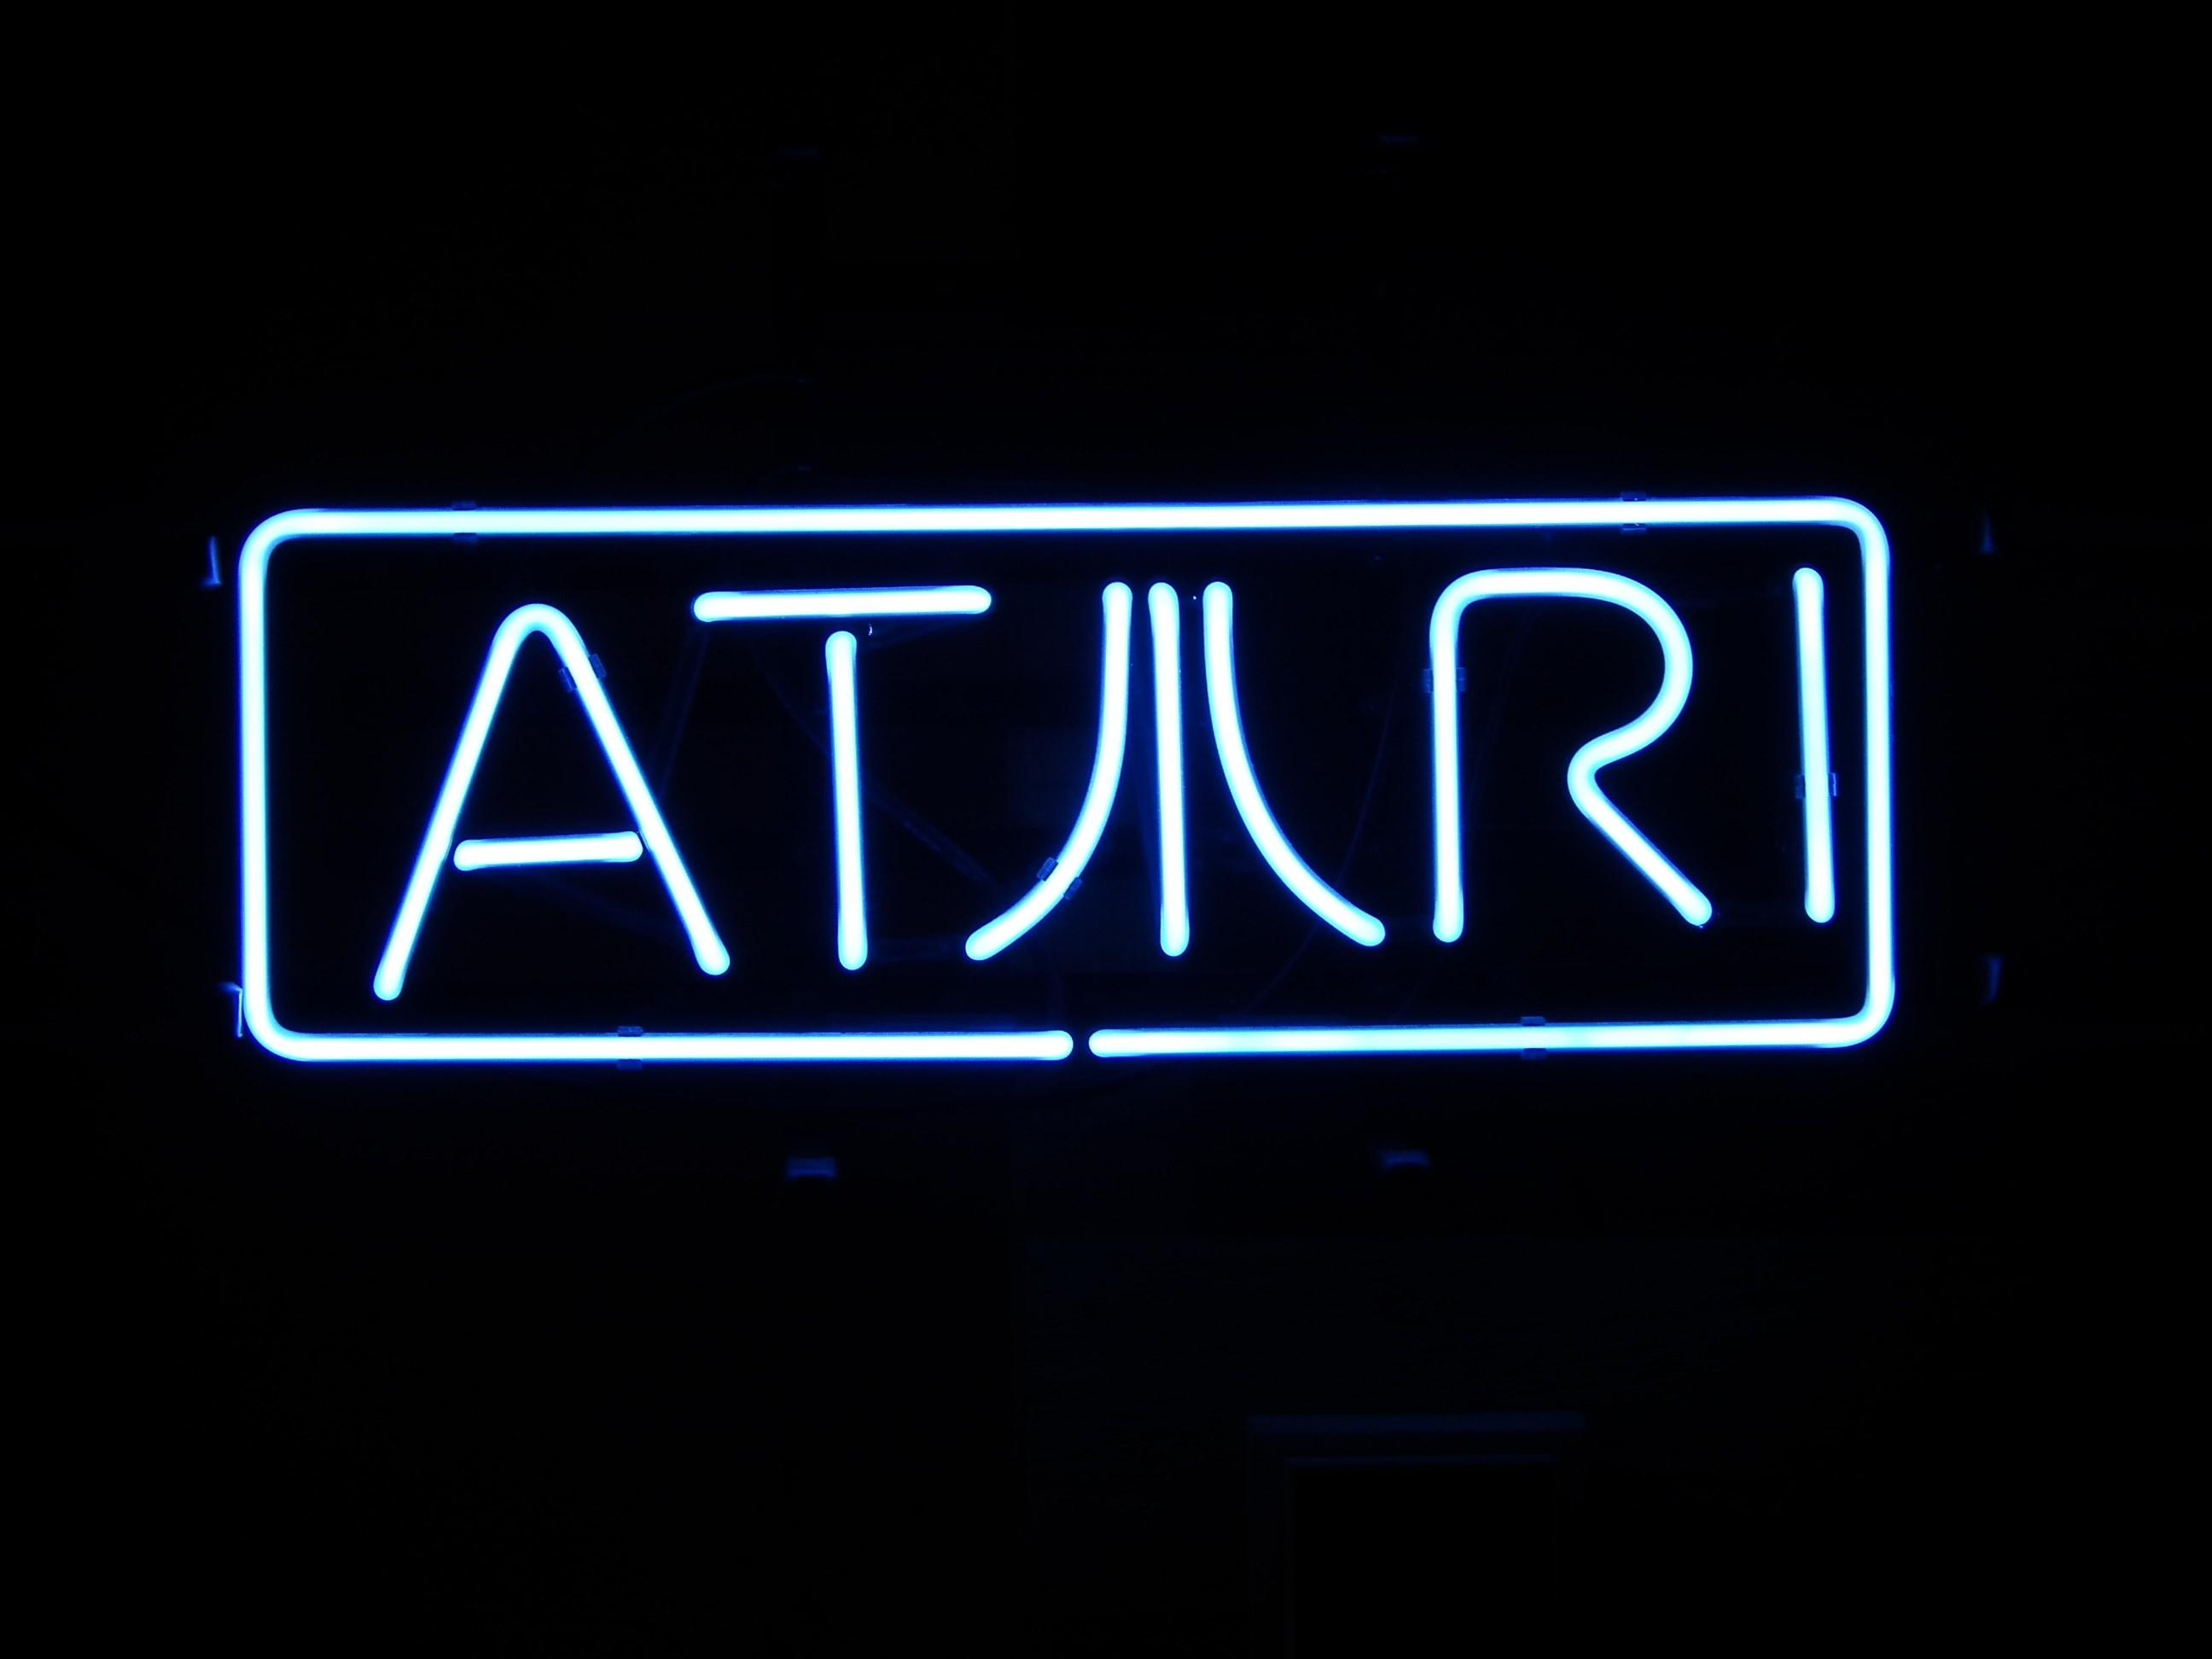 Atari neon sign